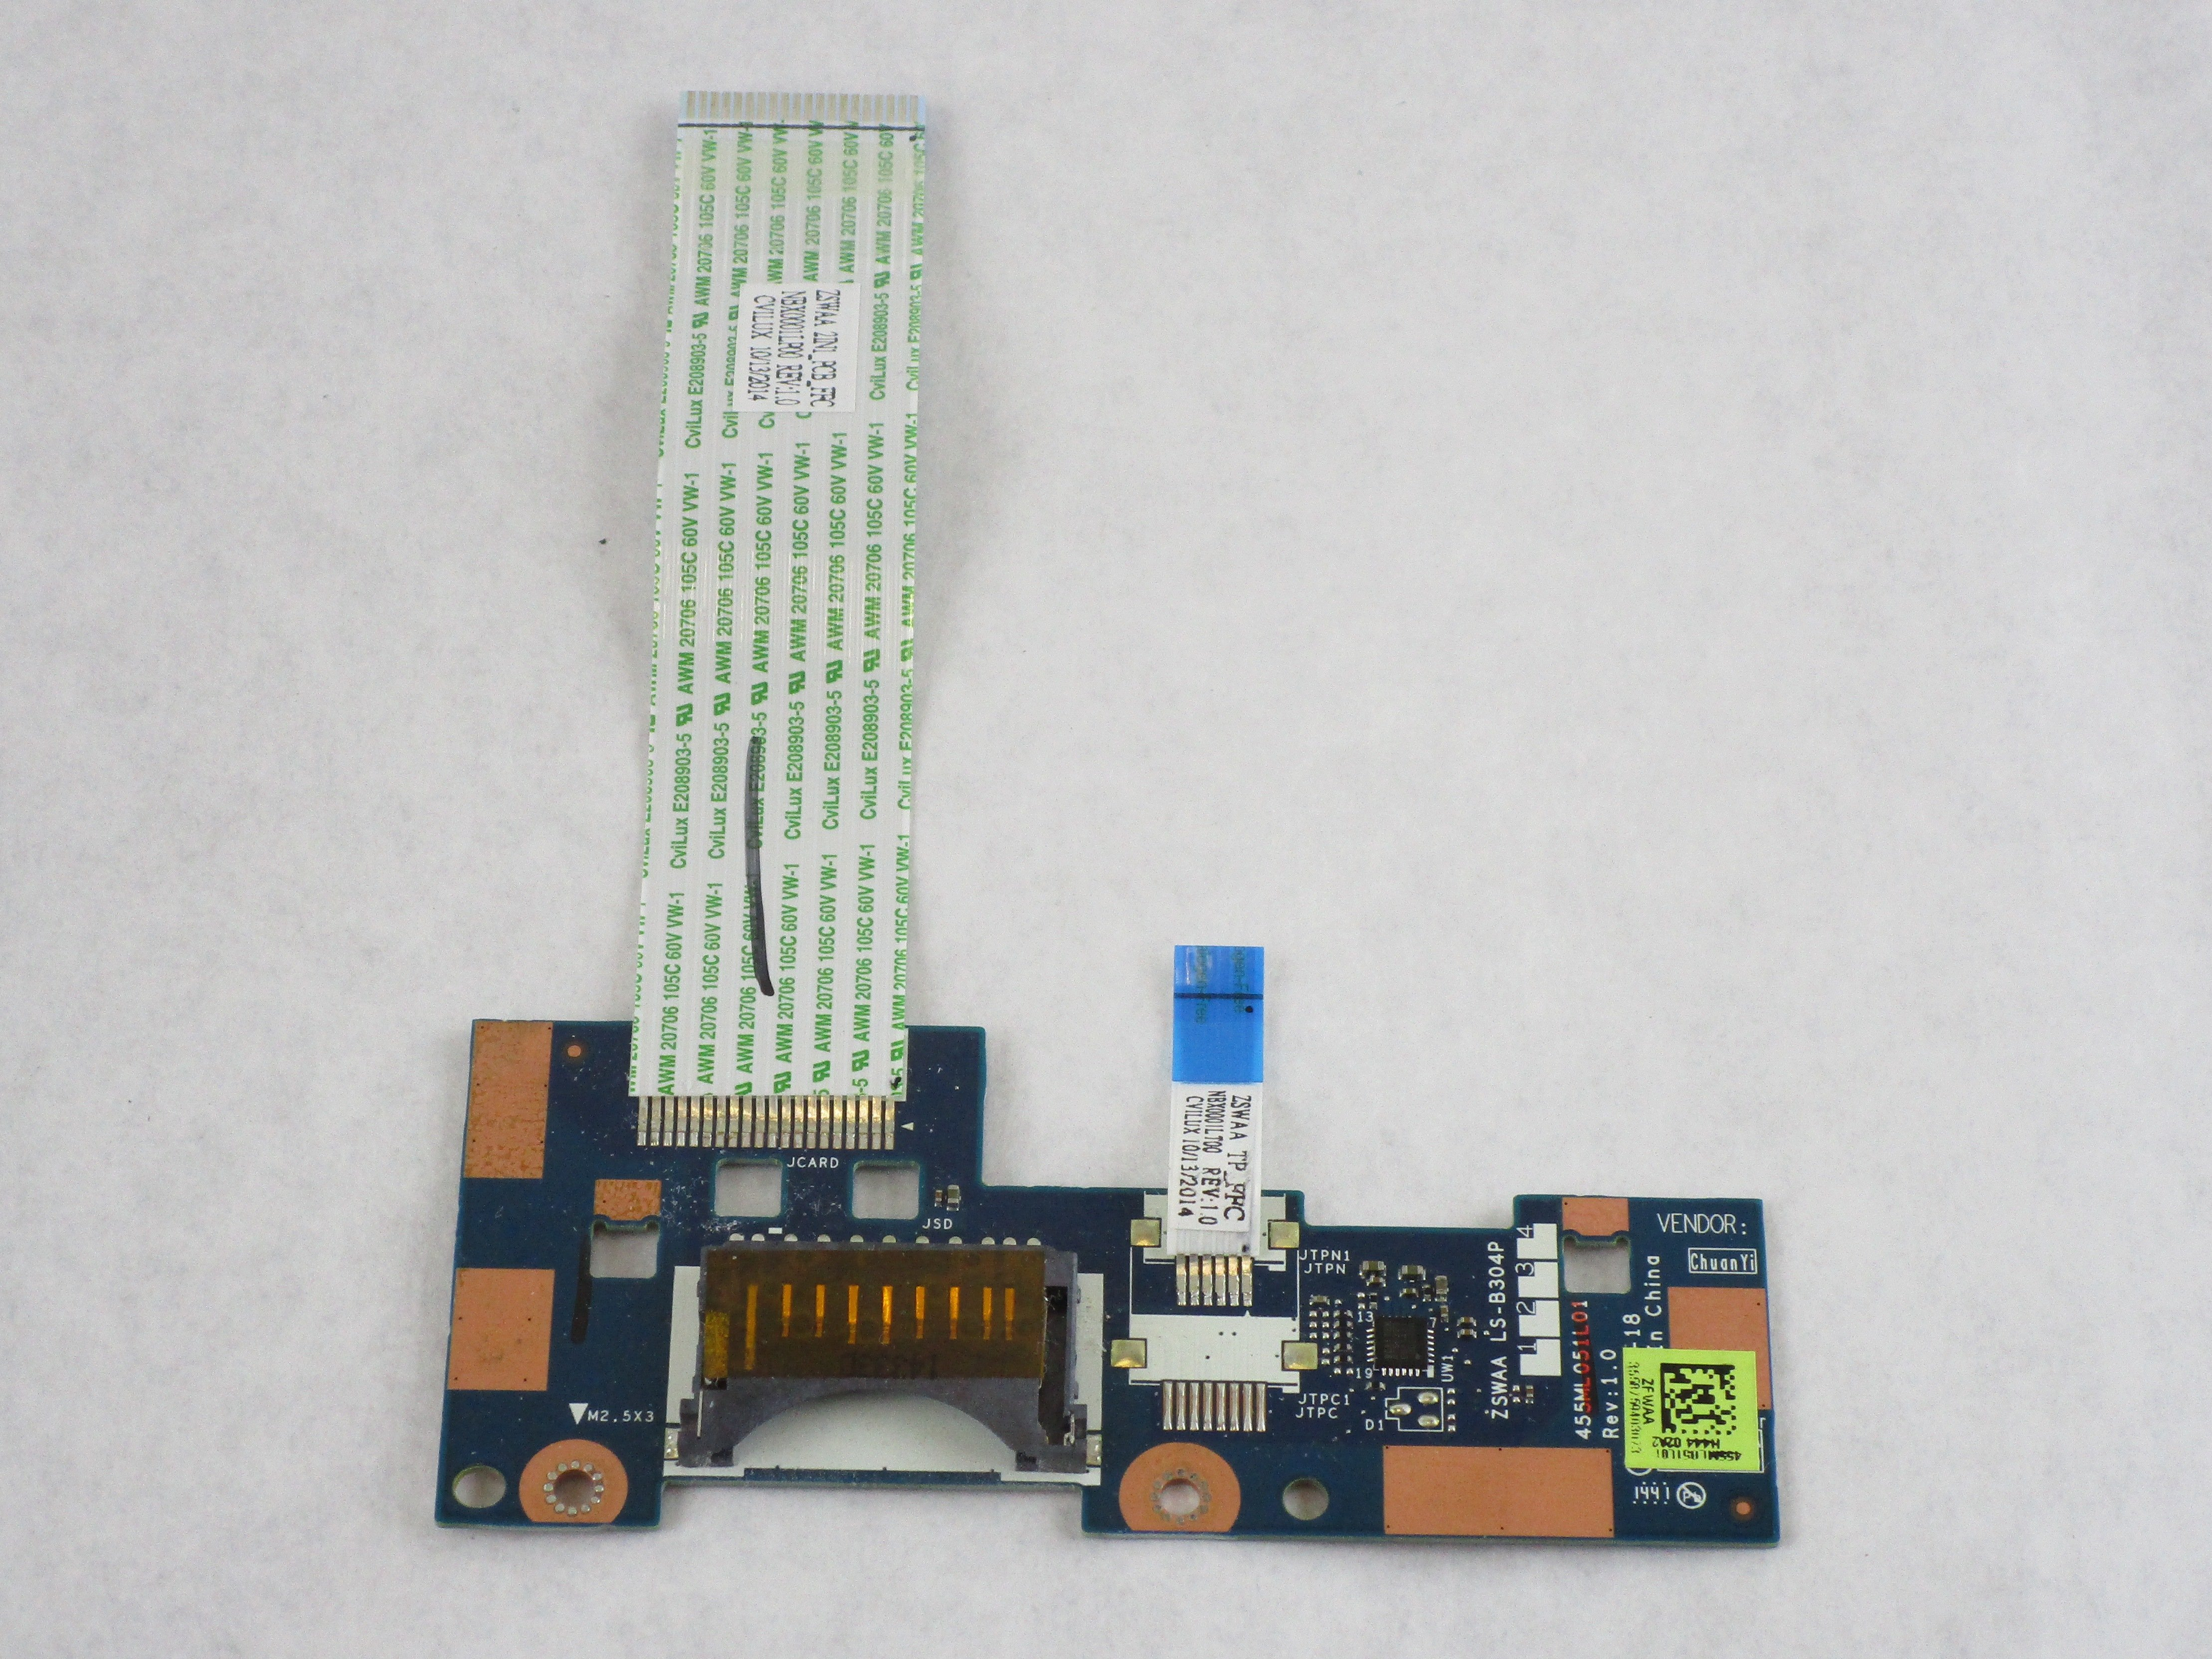 toshiba satellite c55 touchpad drivers